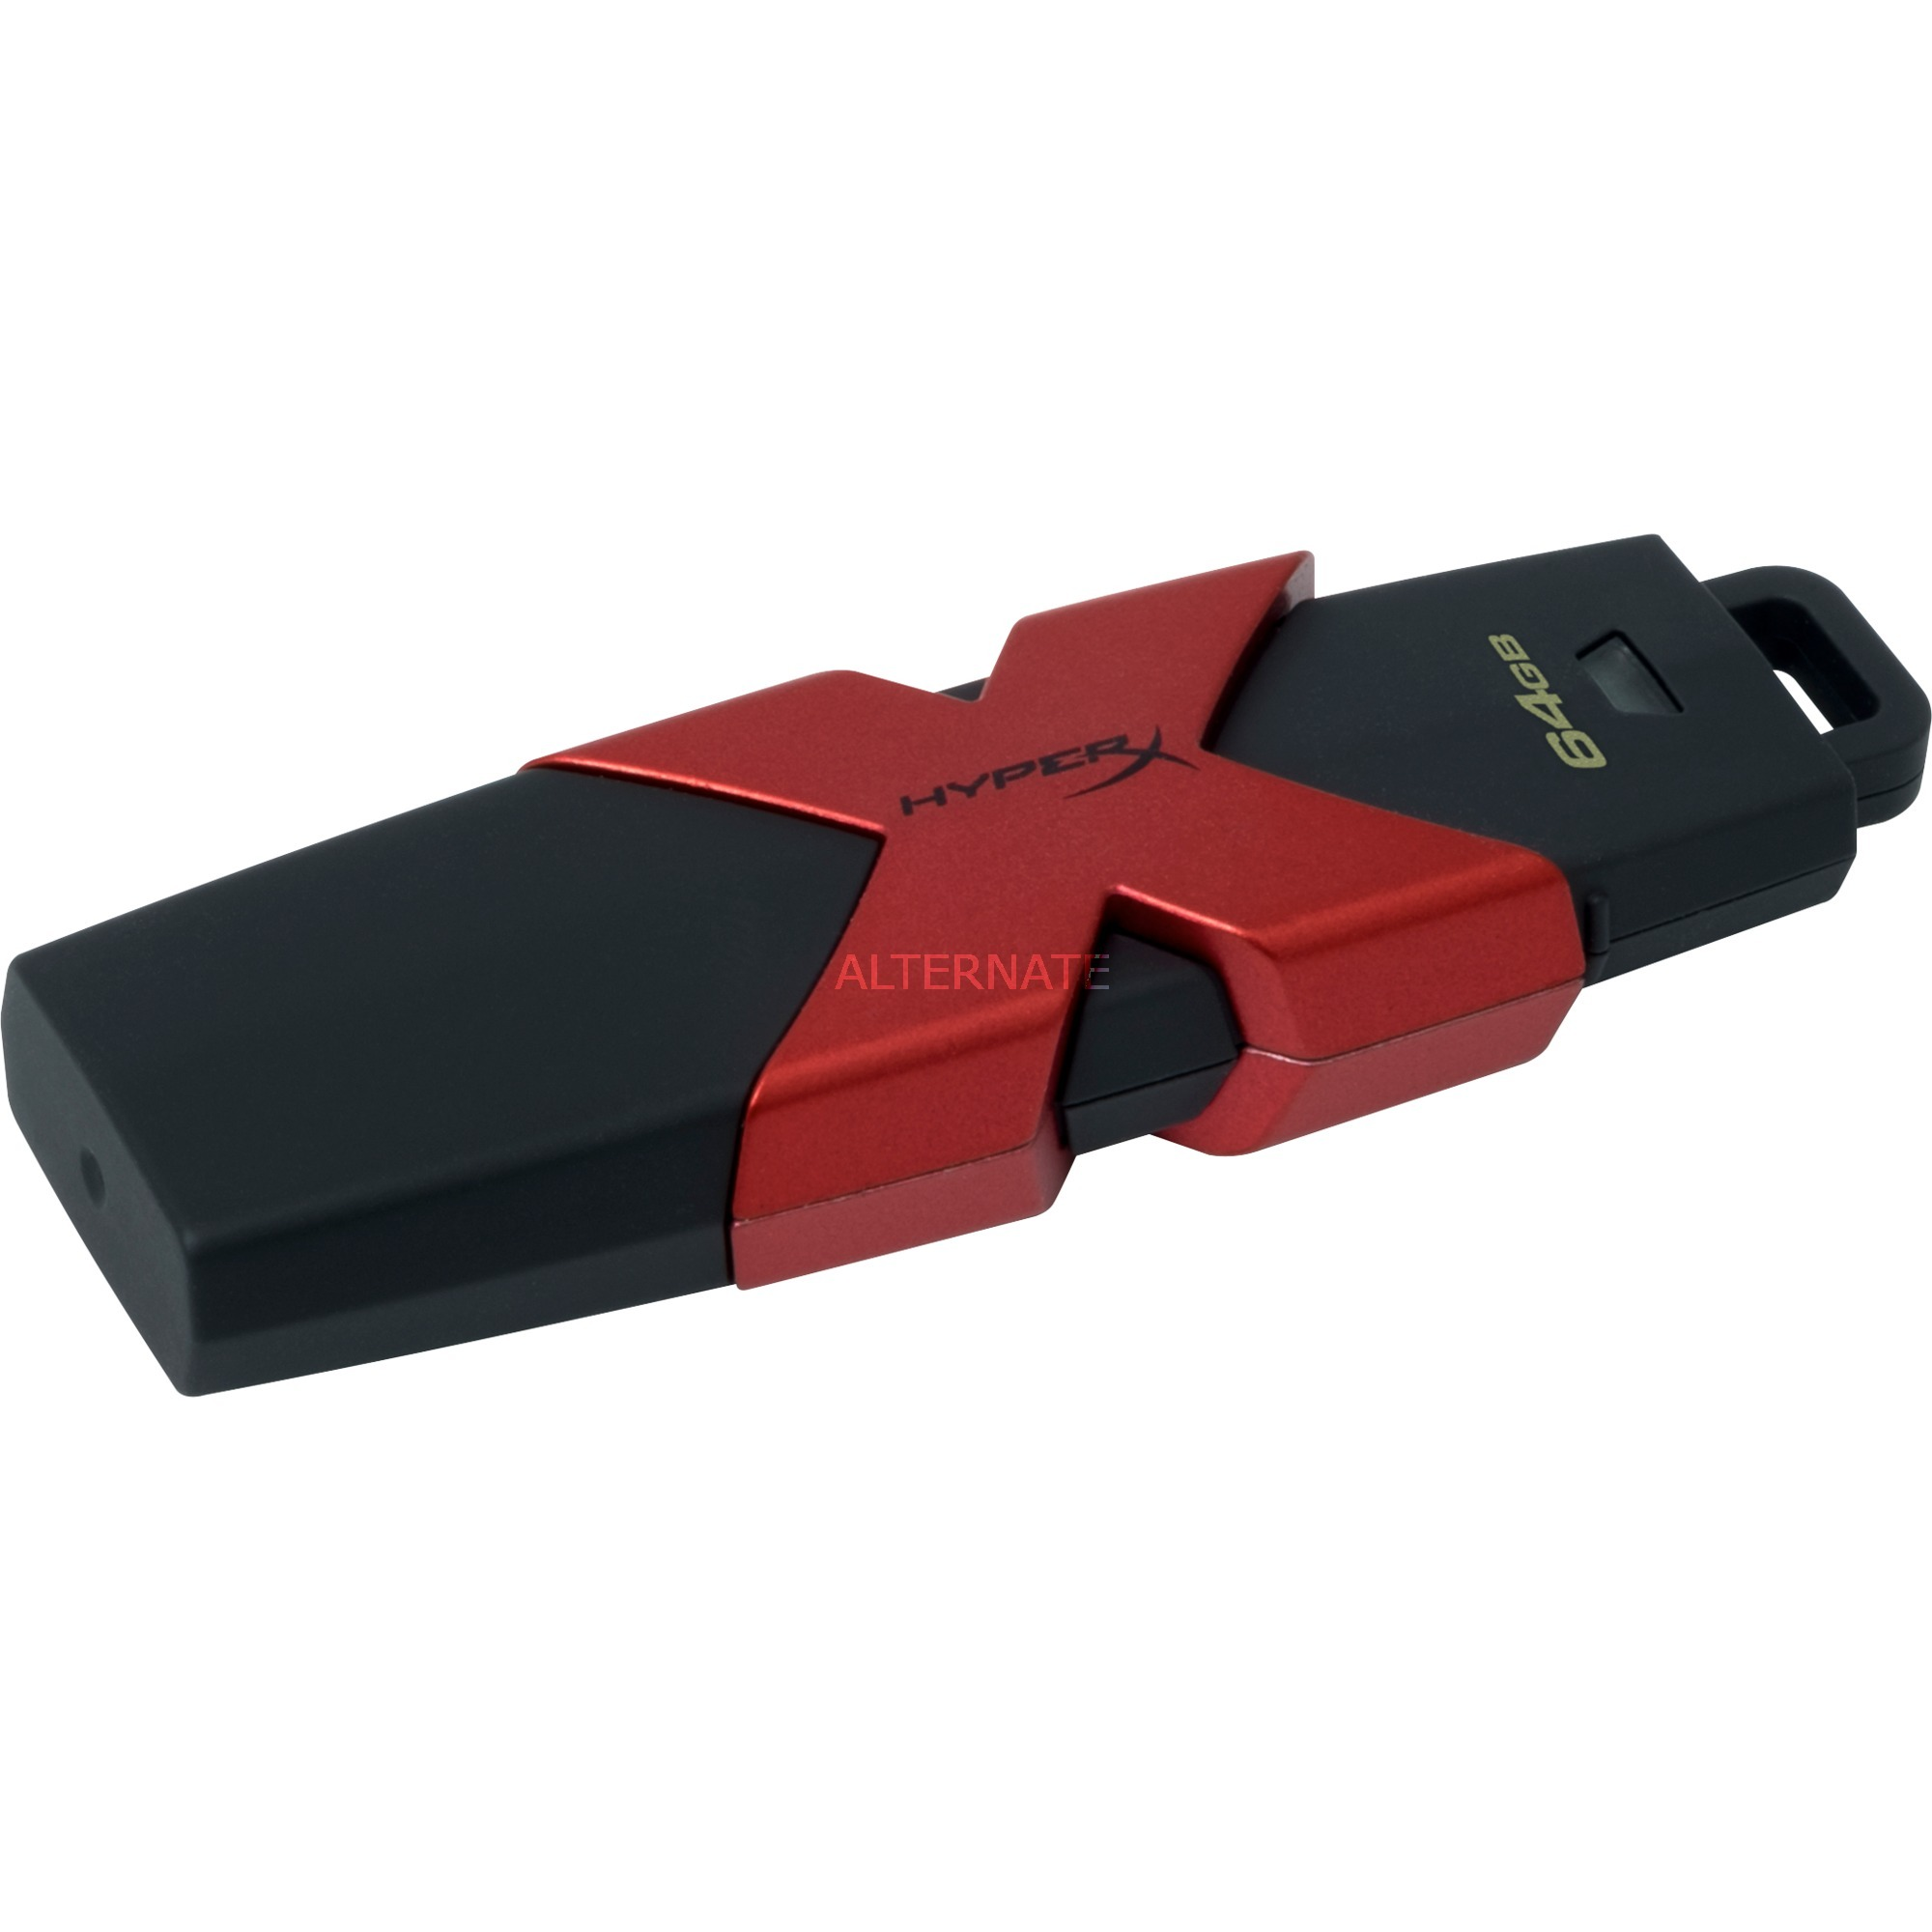 64GB unidad flash USB USB tipo A 3.2 Gen 1 (3.1 Gen 1) Negro, Rojo, Lápiz USB